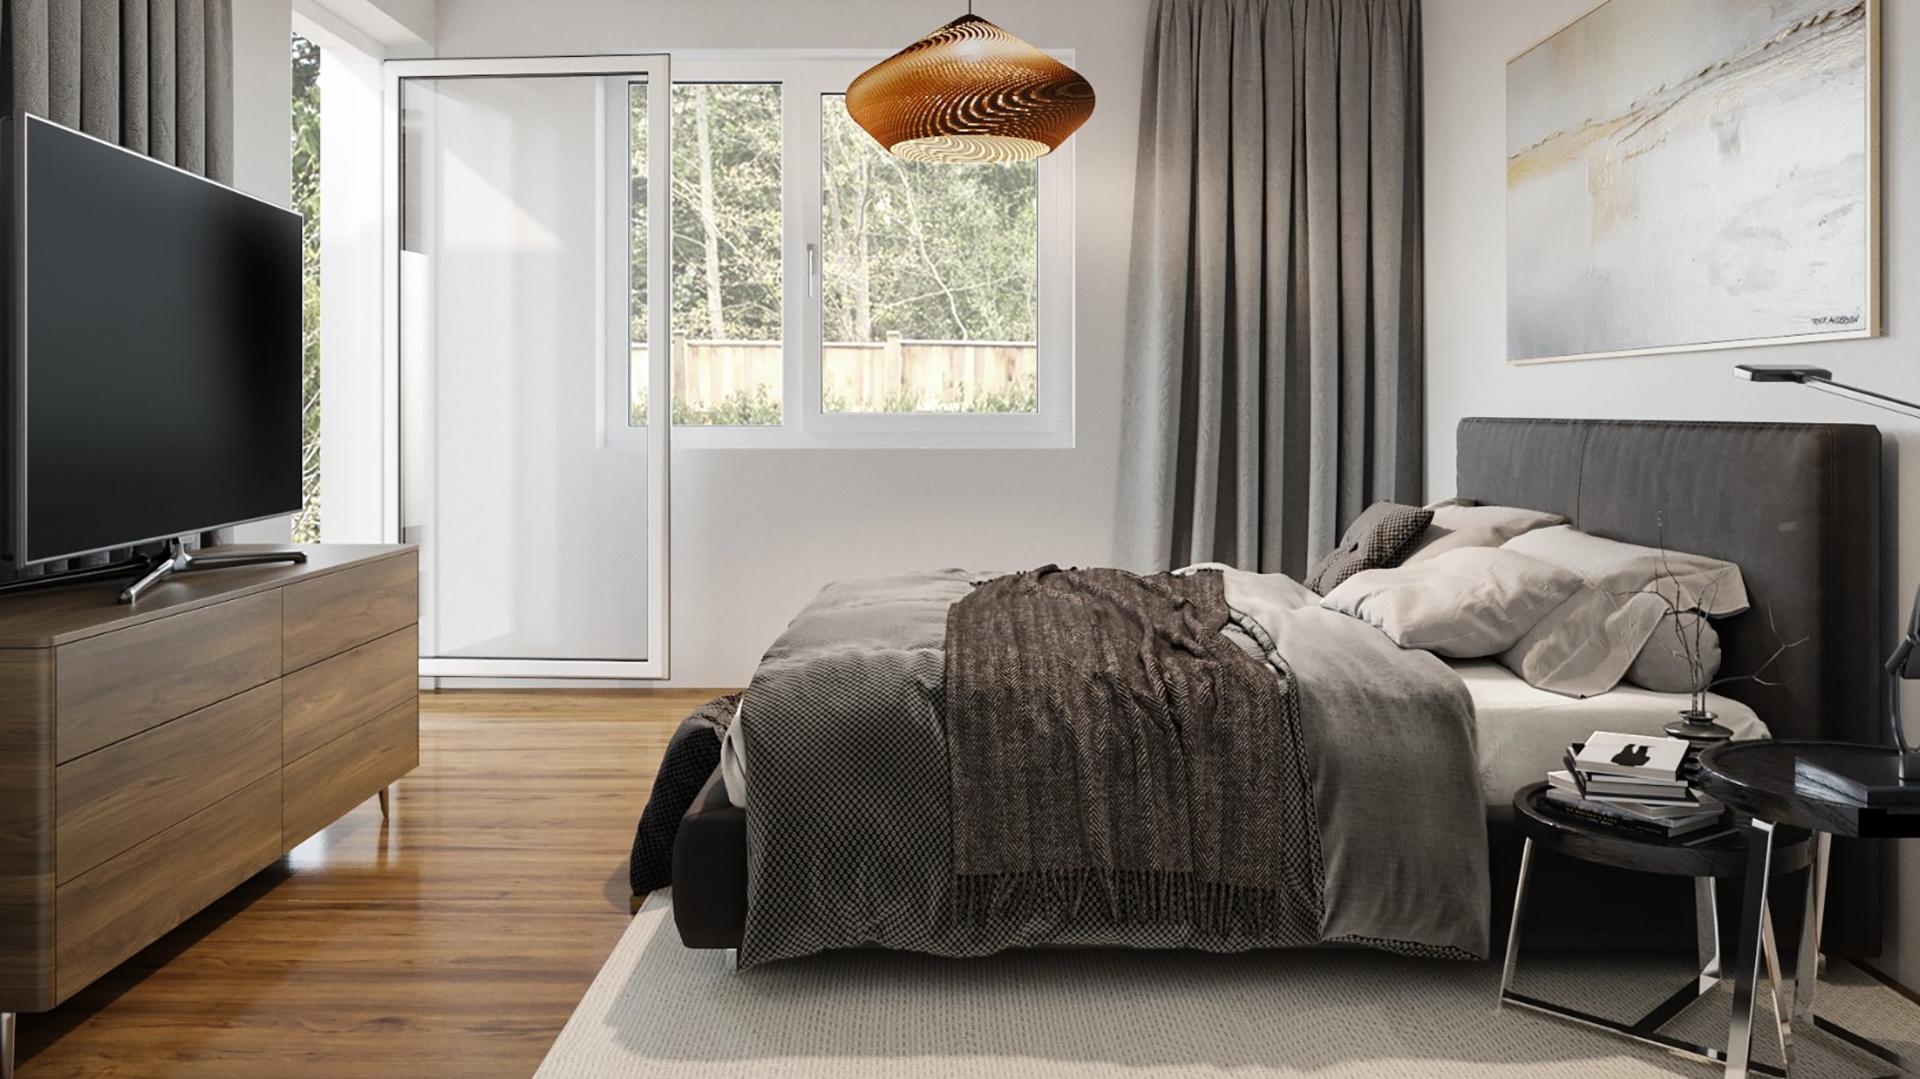 3D Visualization of a Comfortable Bedroom Design